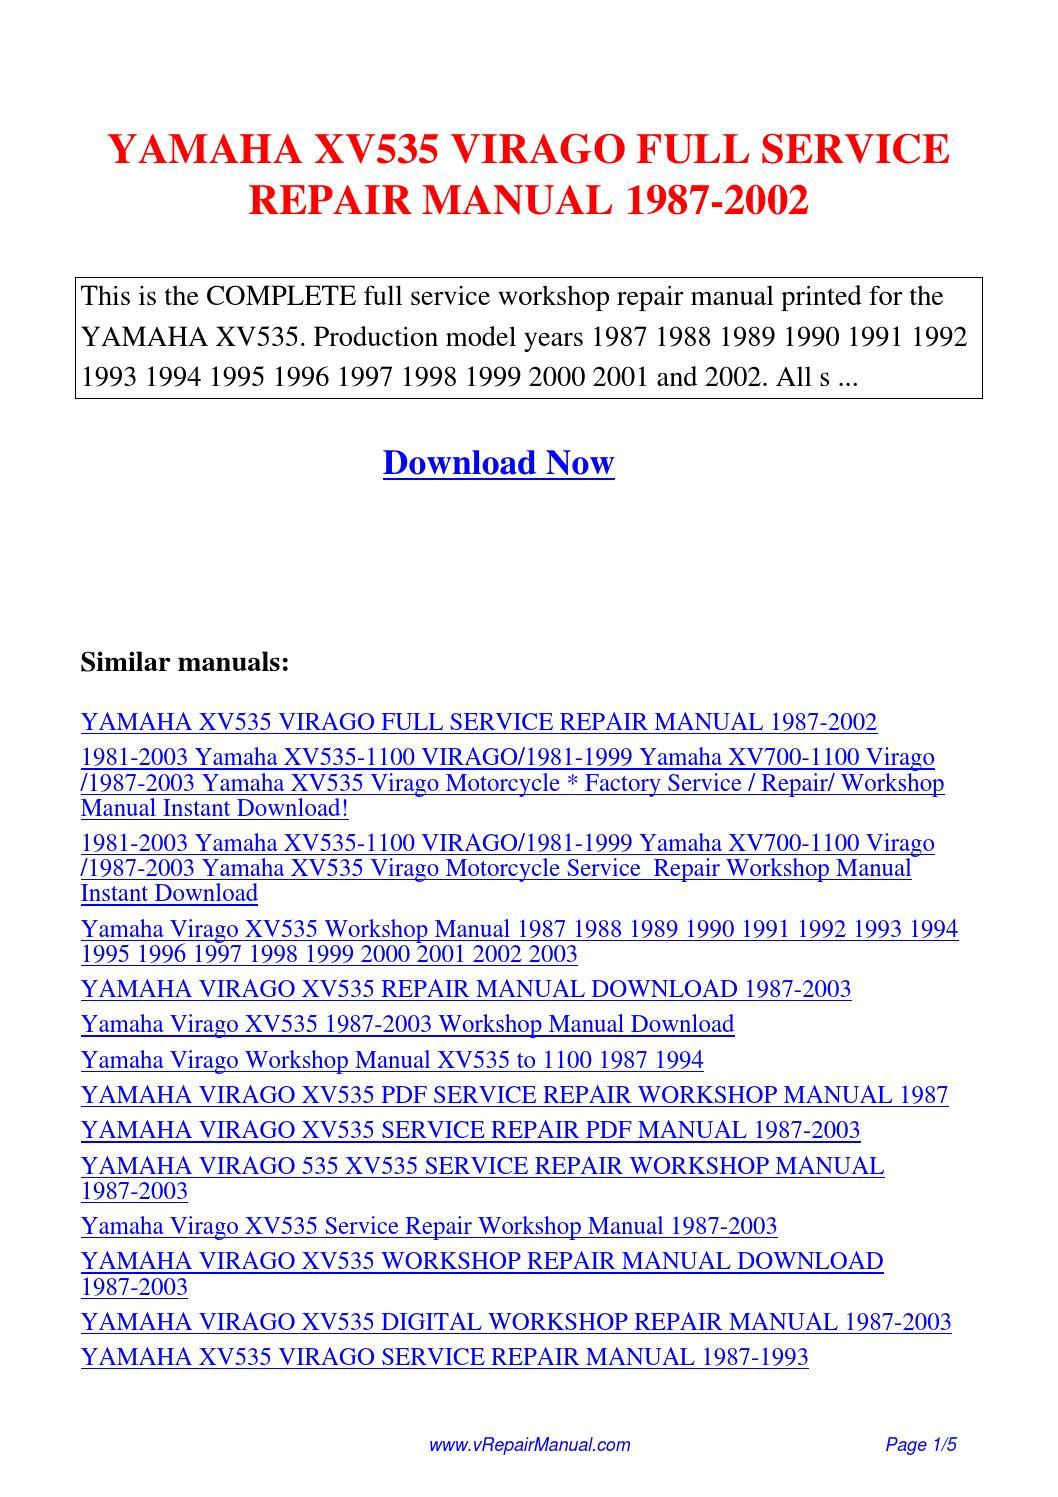 YAMAHA XV535 VIRAGO FULL SERVICE REPAIR MANUAL 1987-2002.pdf by Ting Wang -  issuu